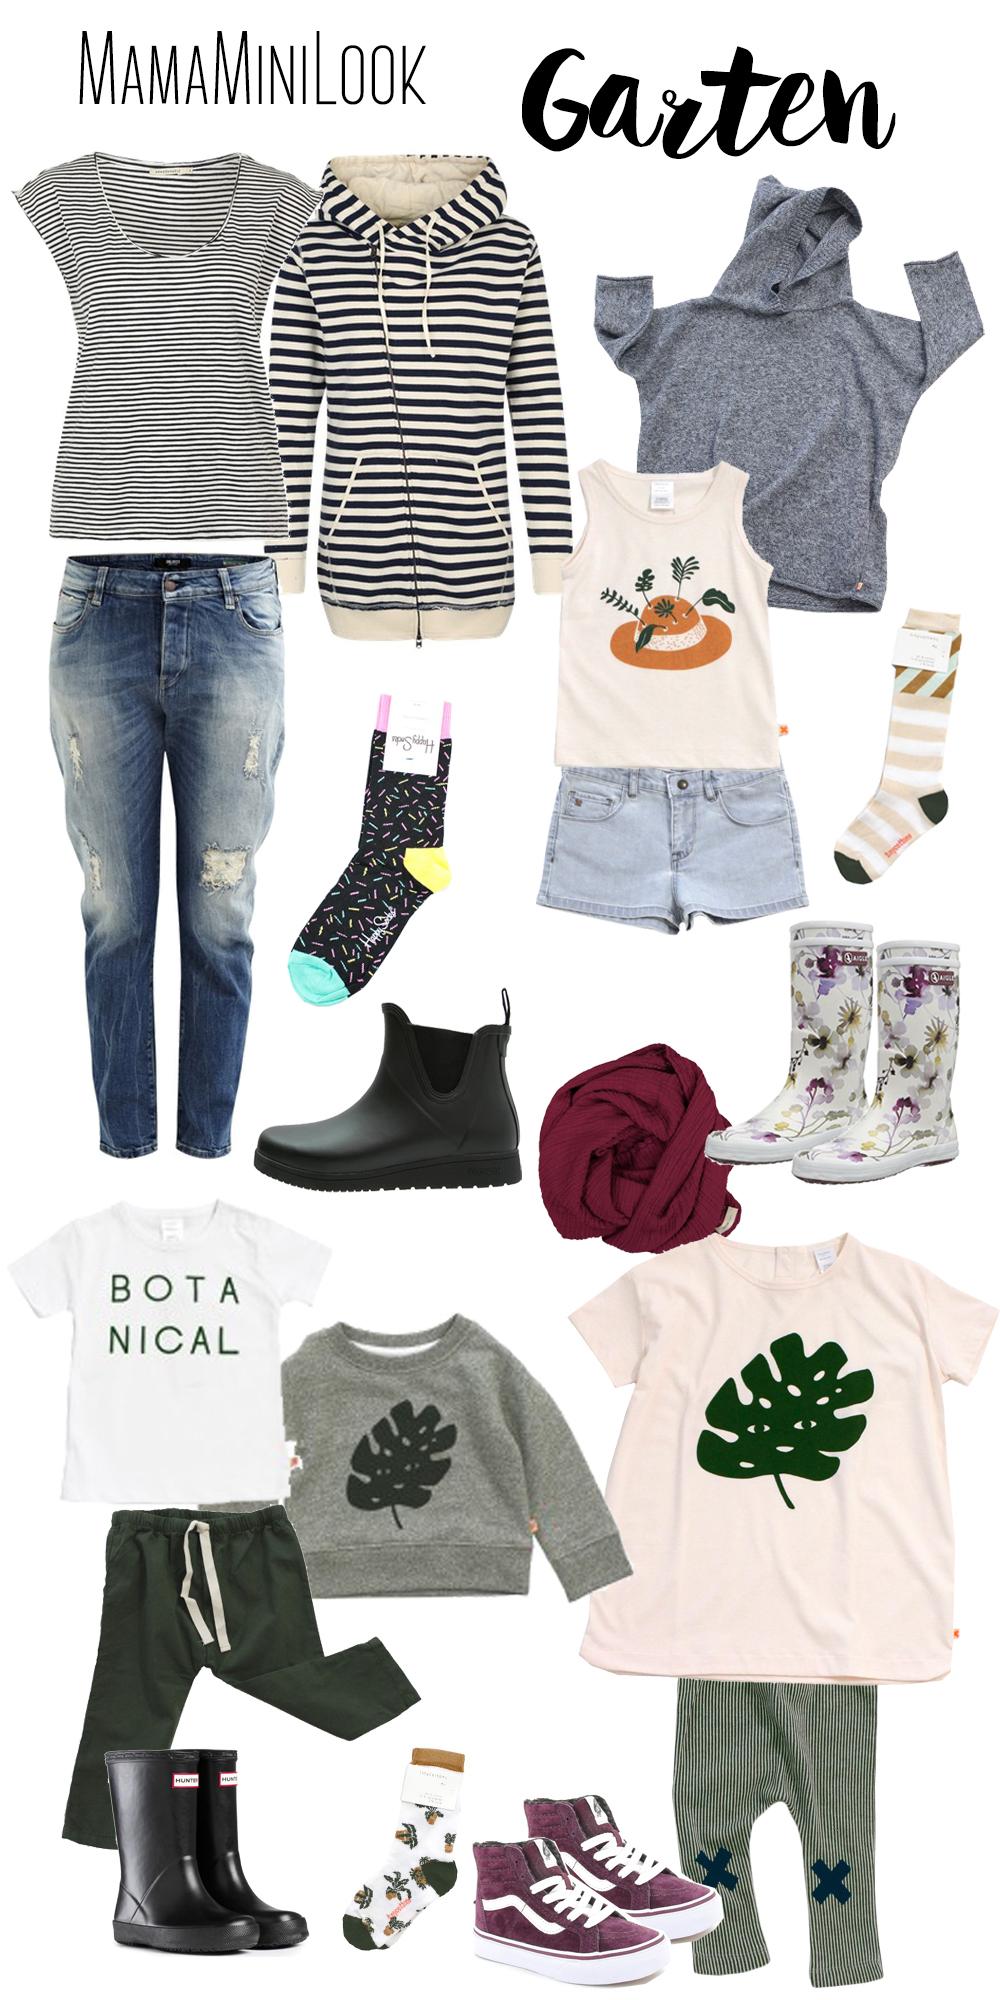 Gartenoutfit für Mama + Mini | Pinkepank